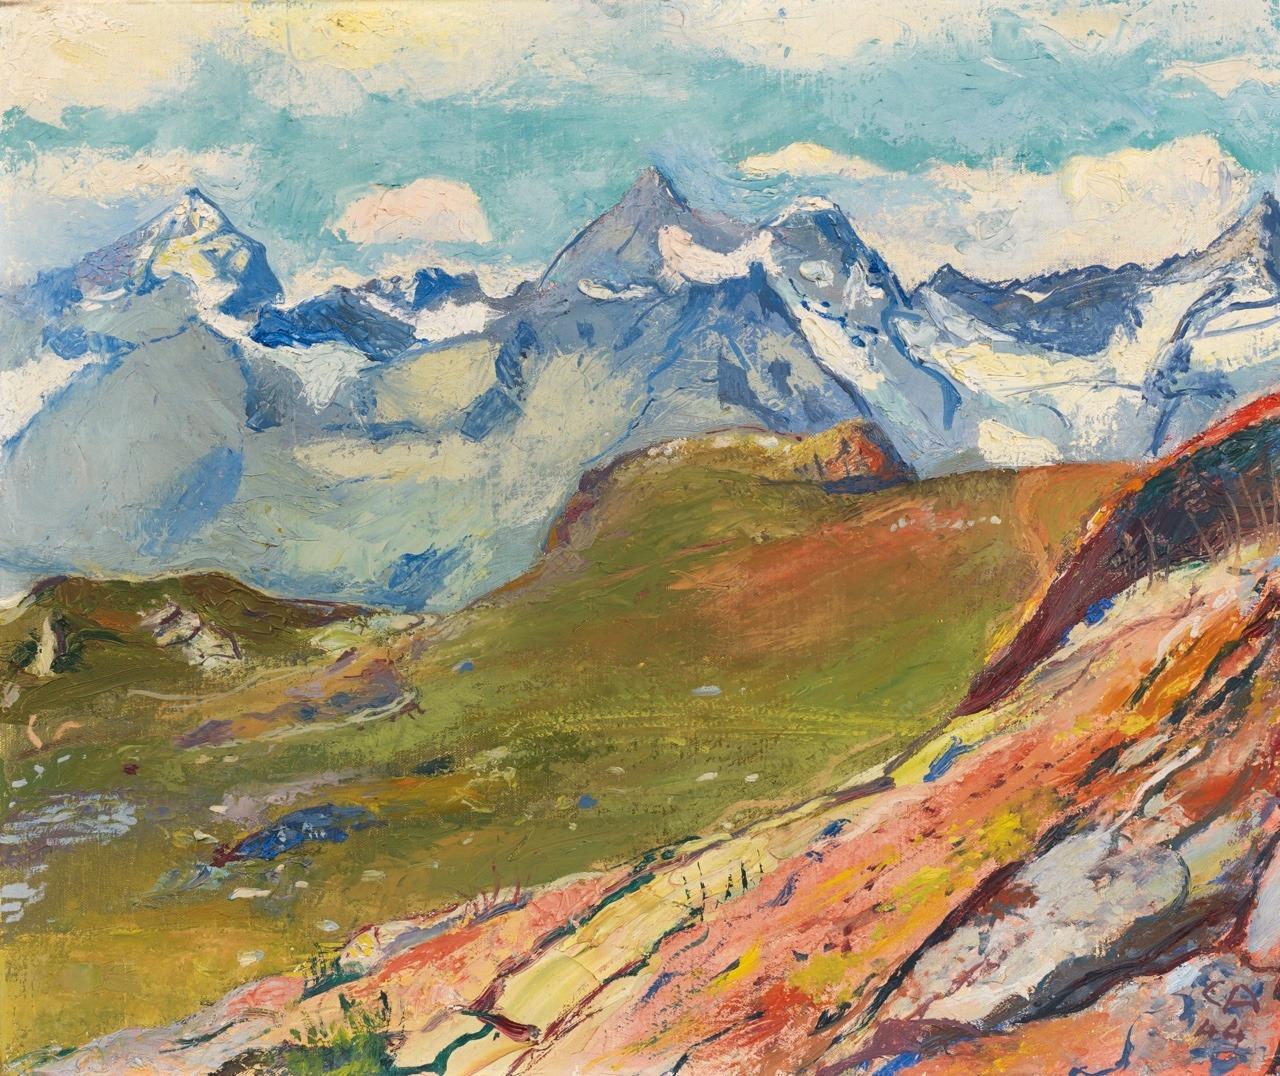 riffelberg-1944-by-cuno-amiet